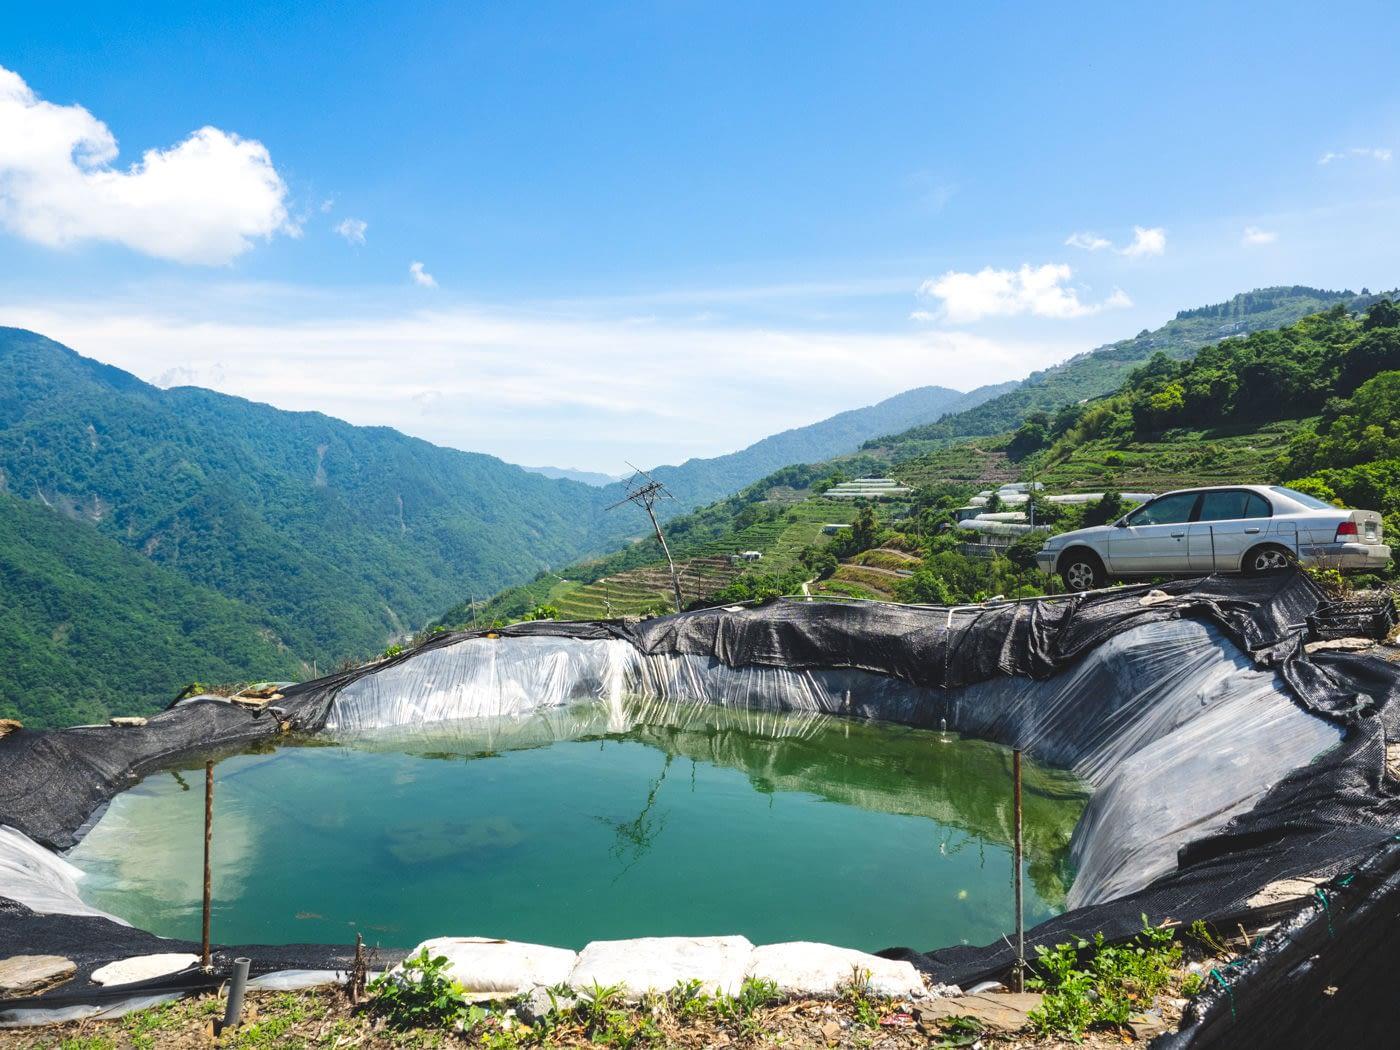 Taiwan - Qingjing - Random puddle of water